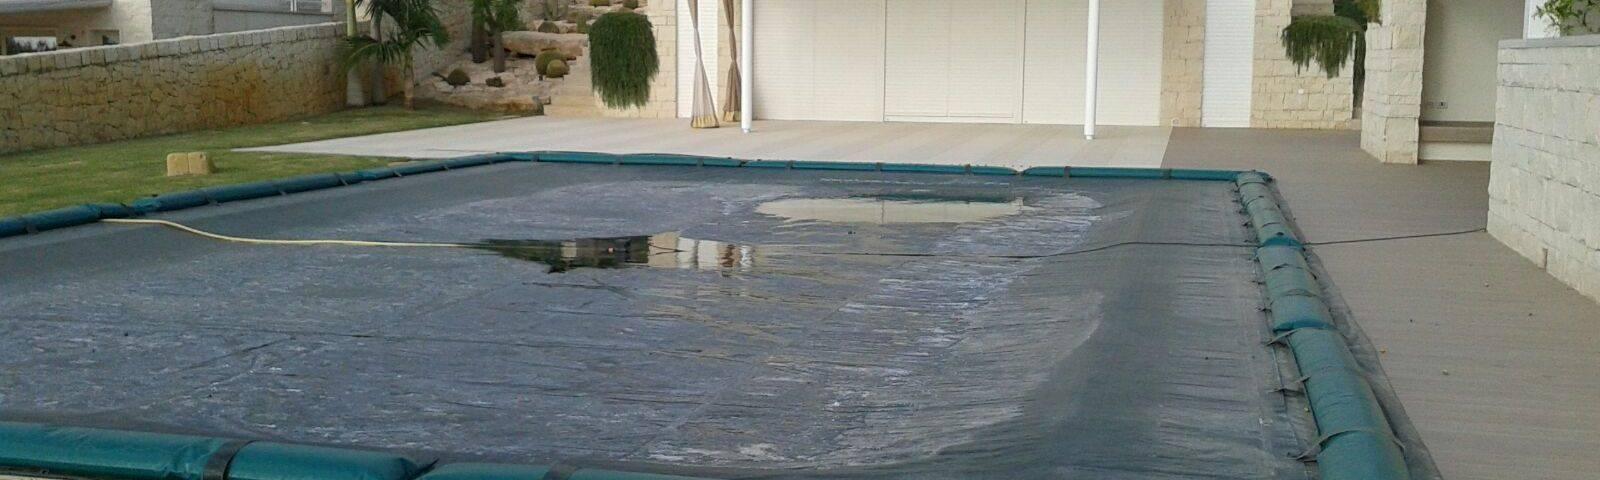 Chiusura invernale piscina super clorazione pulizia for Clorazione piscine